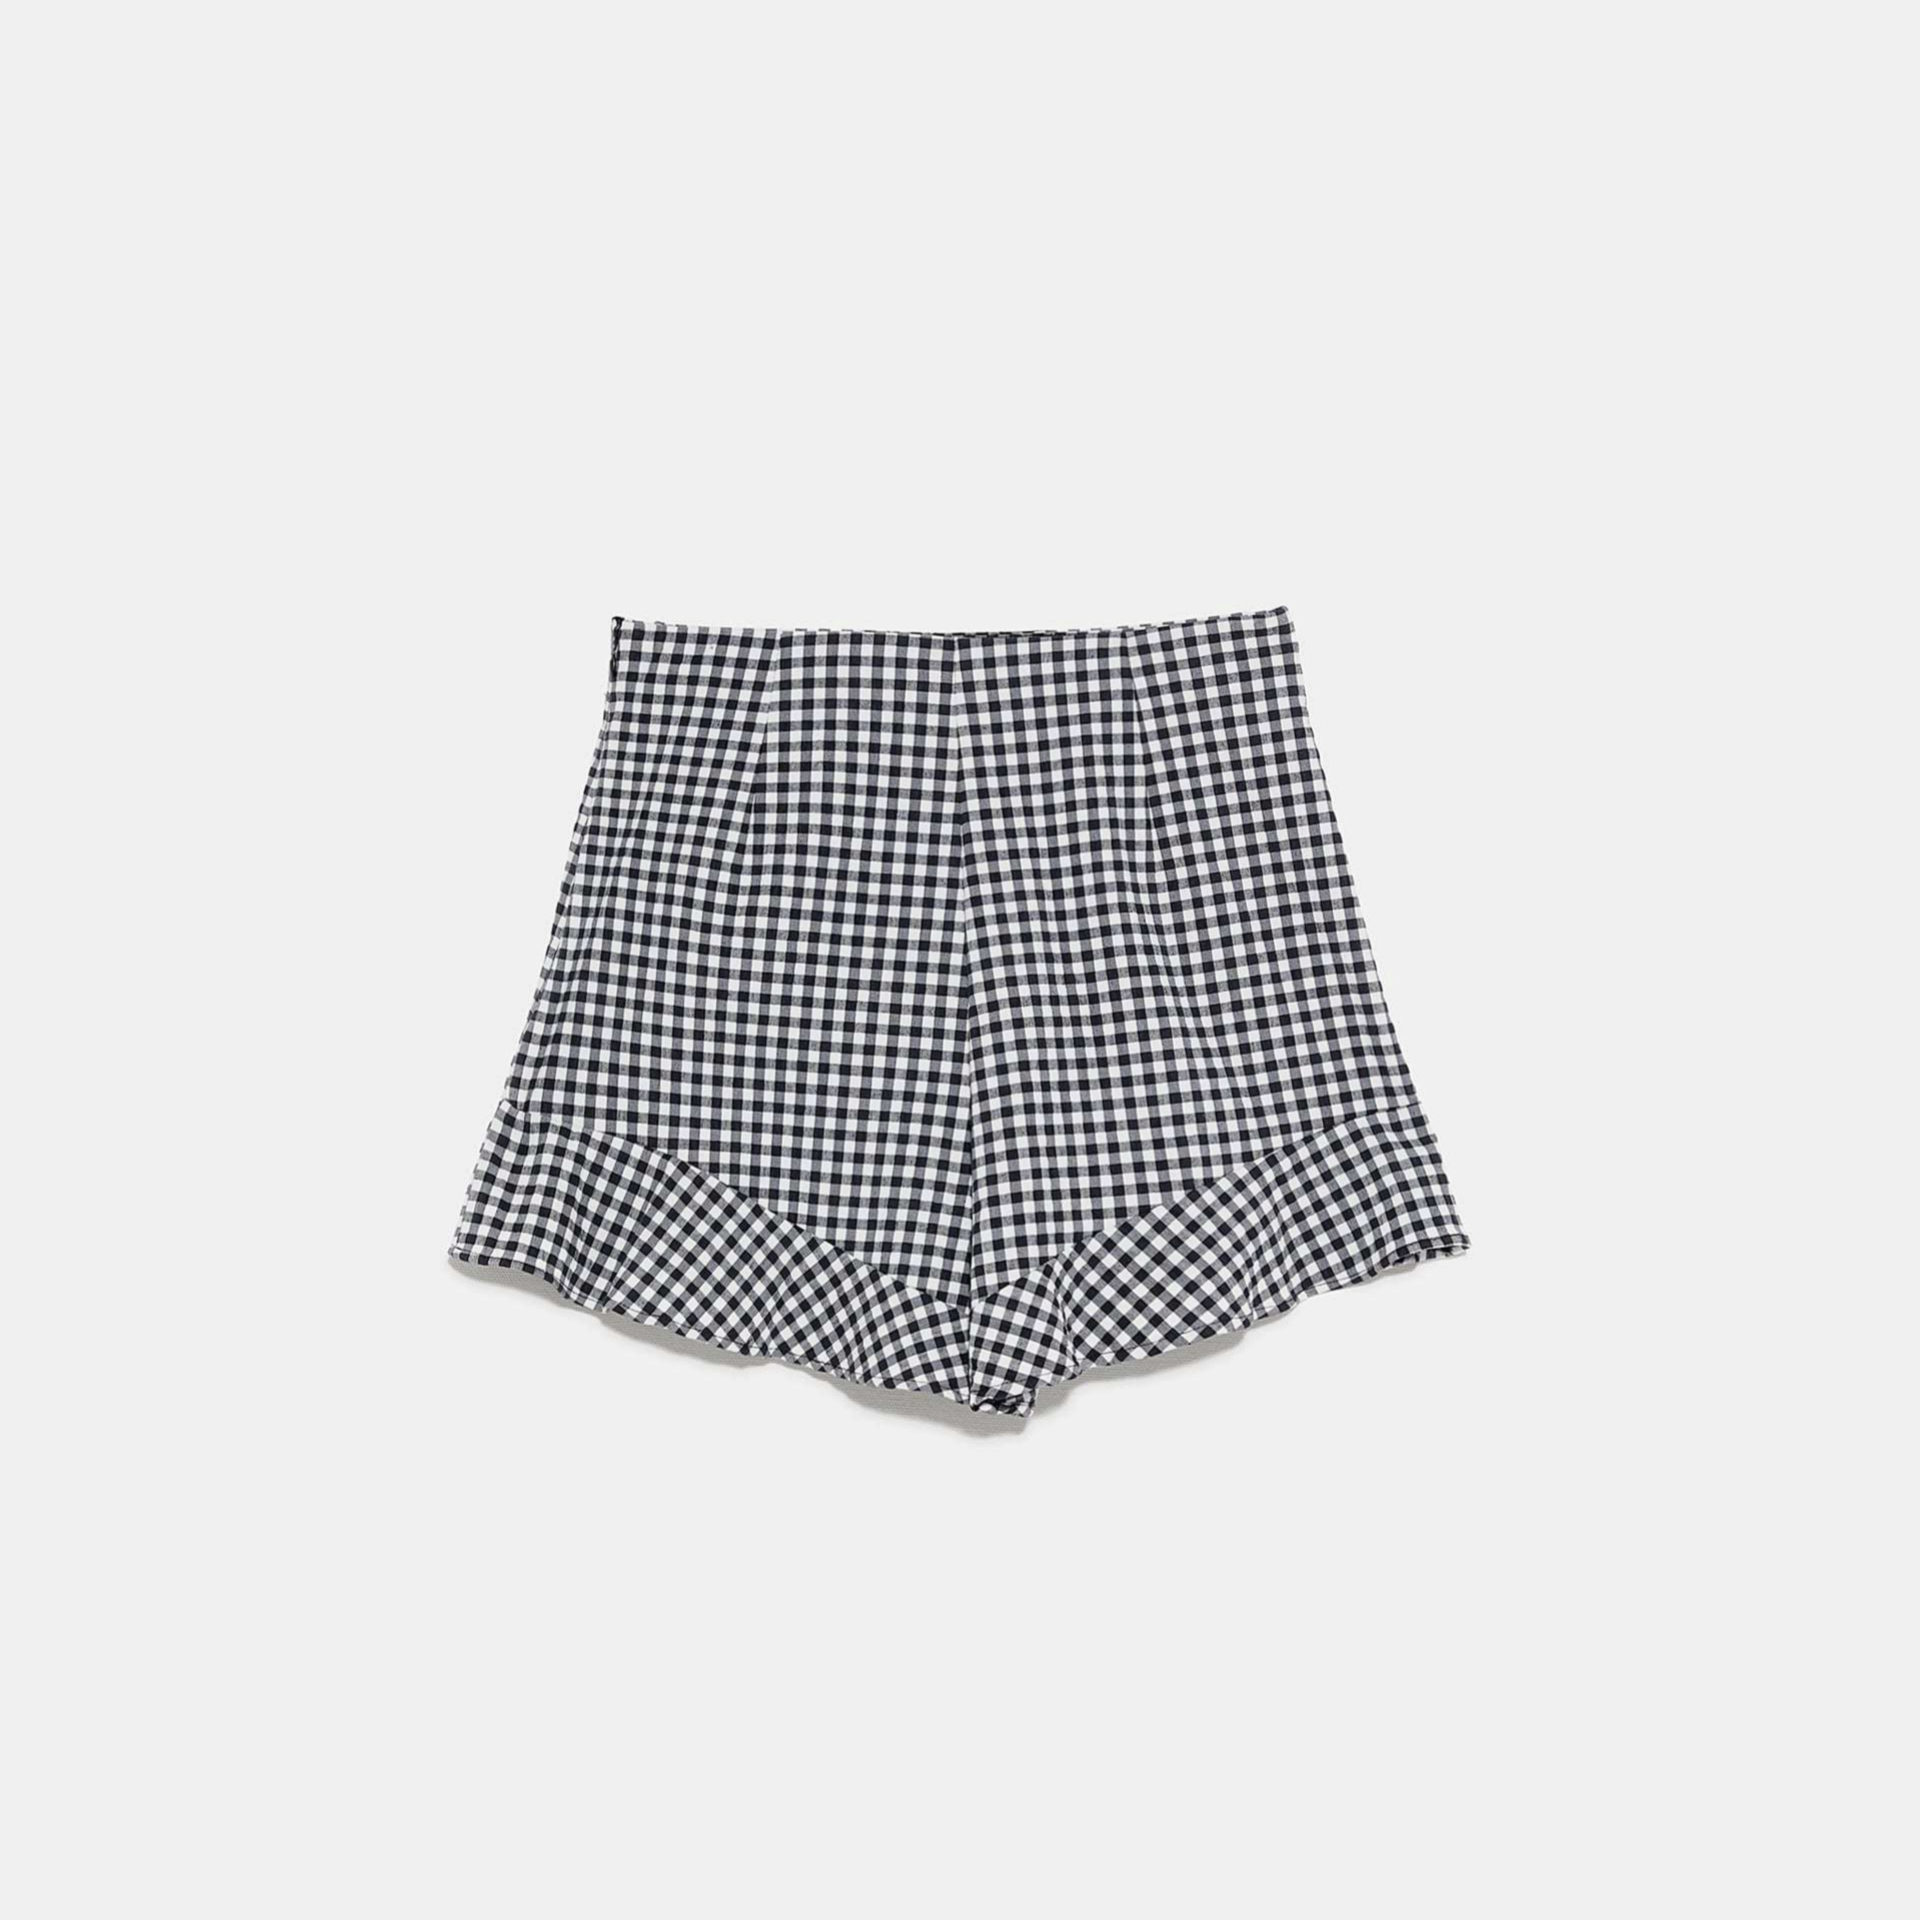 Shorts de cuadros vichy de Zara